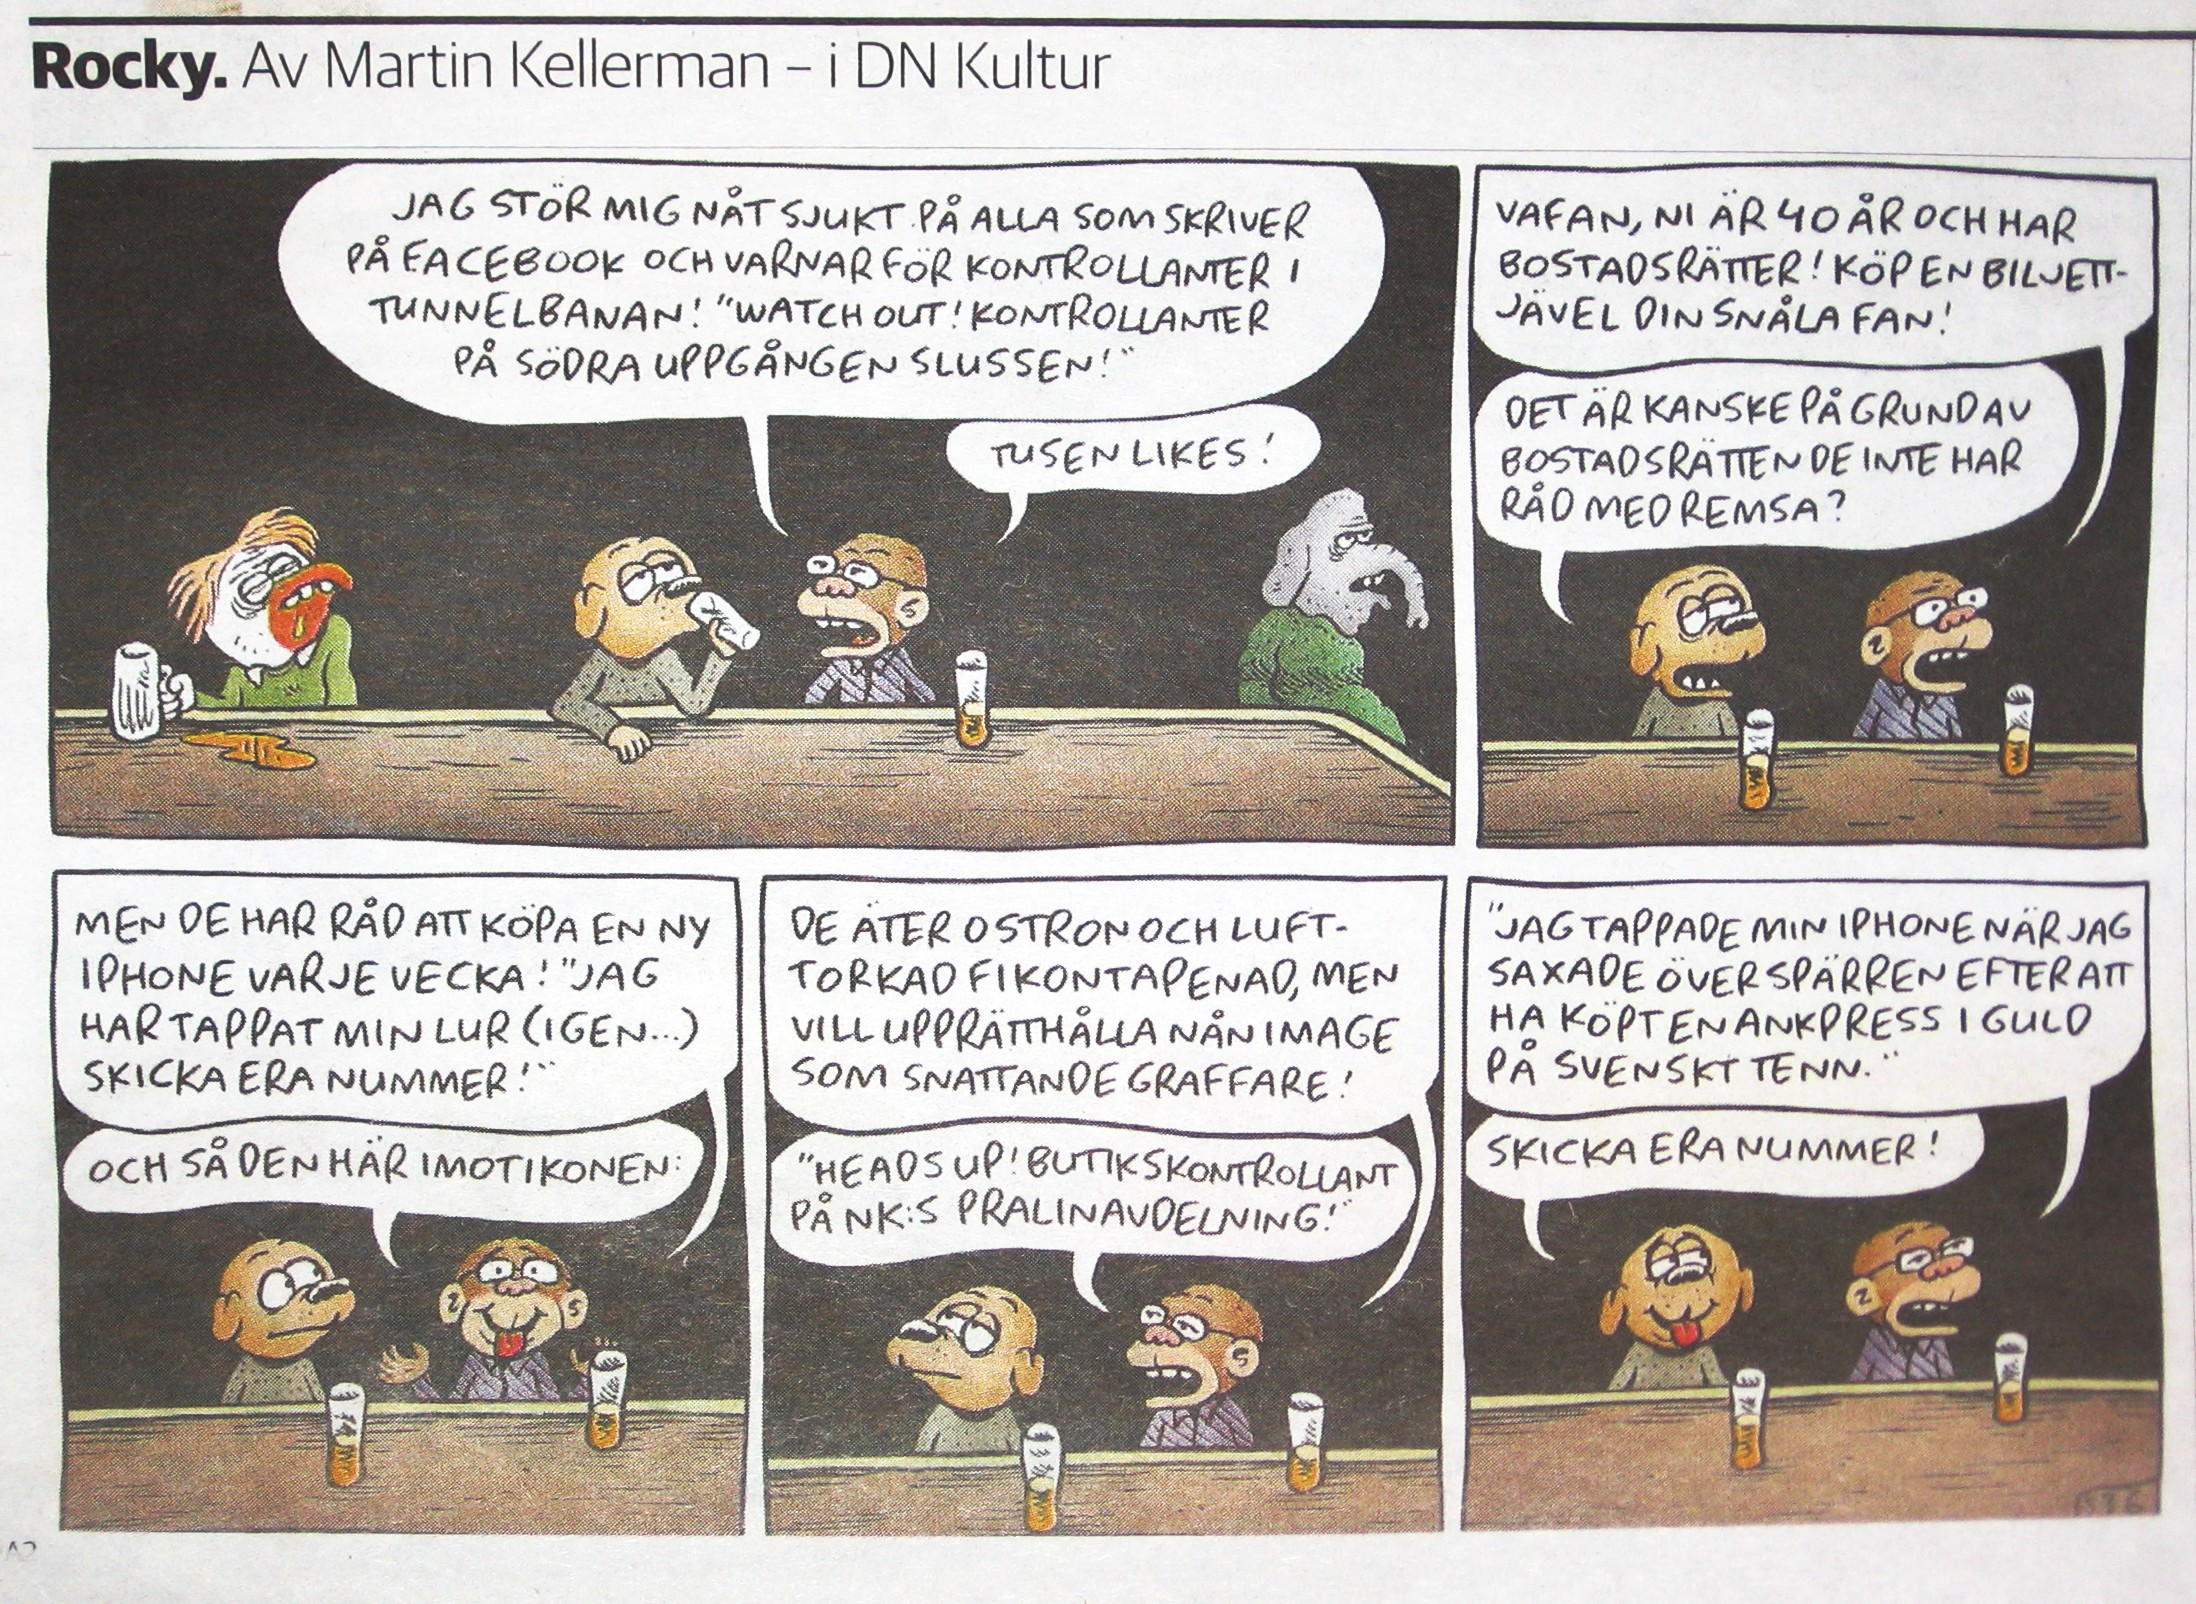 rocky martin kjellerman plankare Dn kultur 20130512